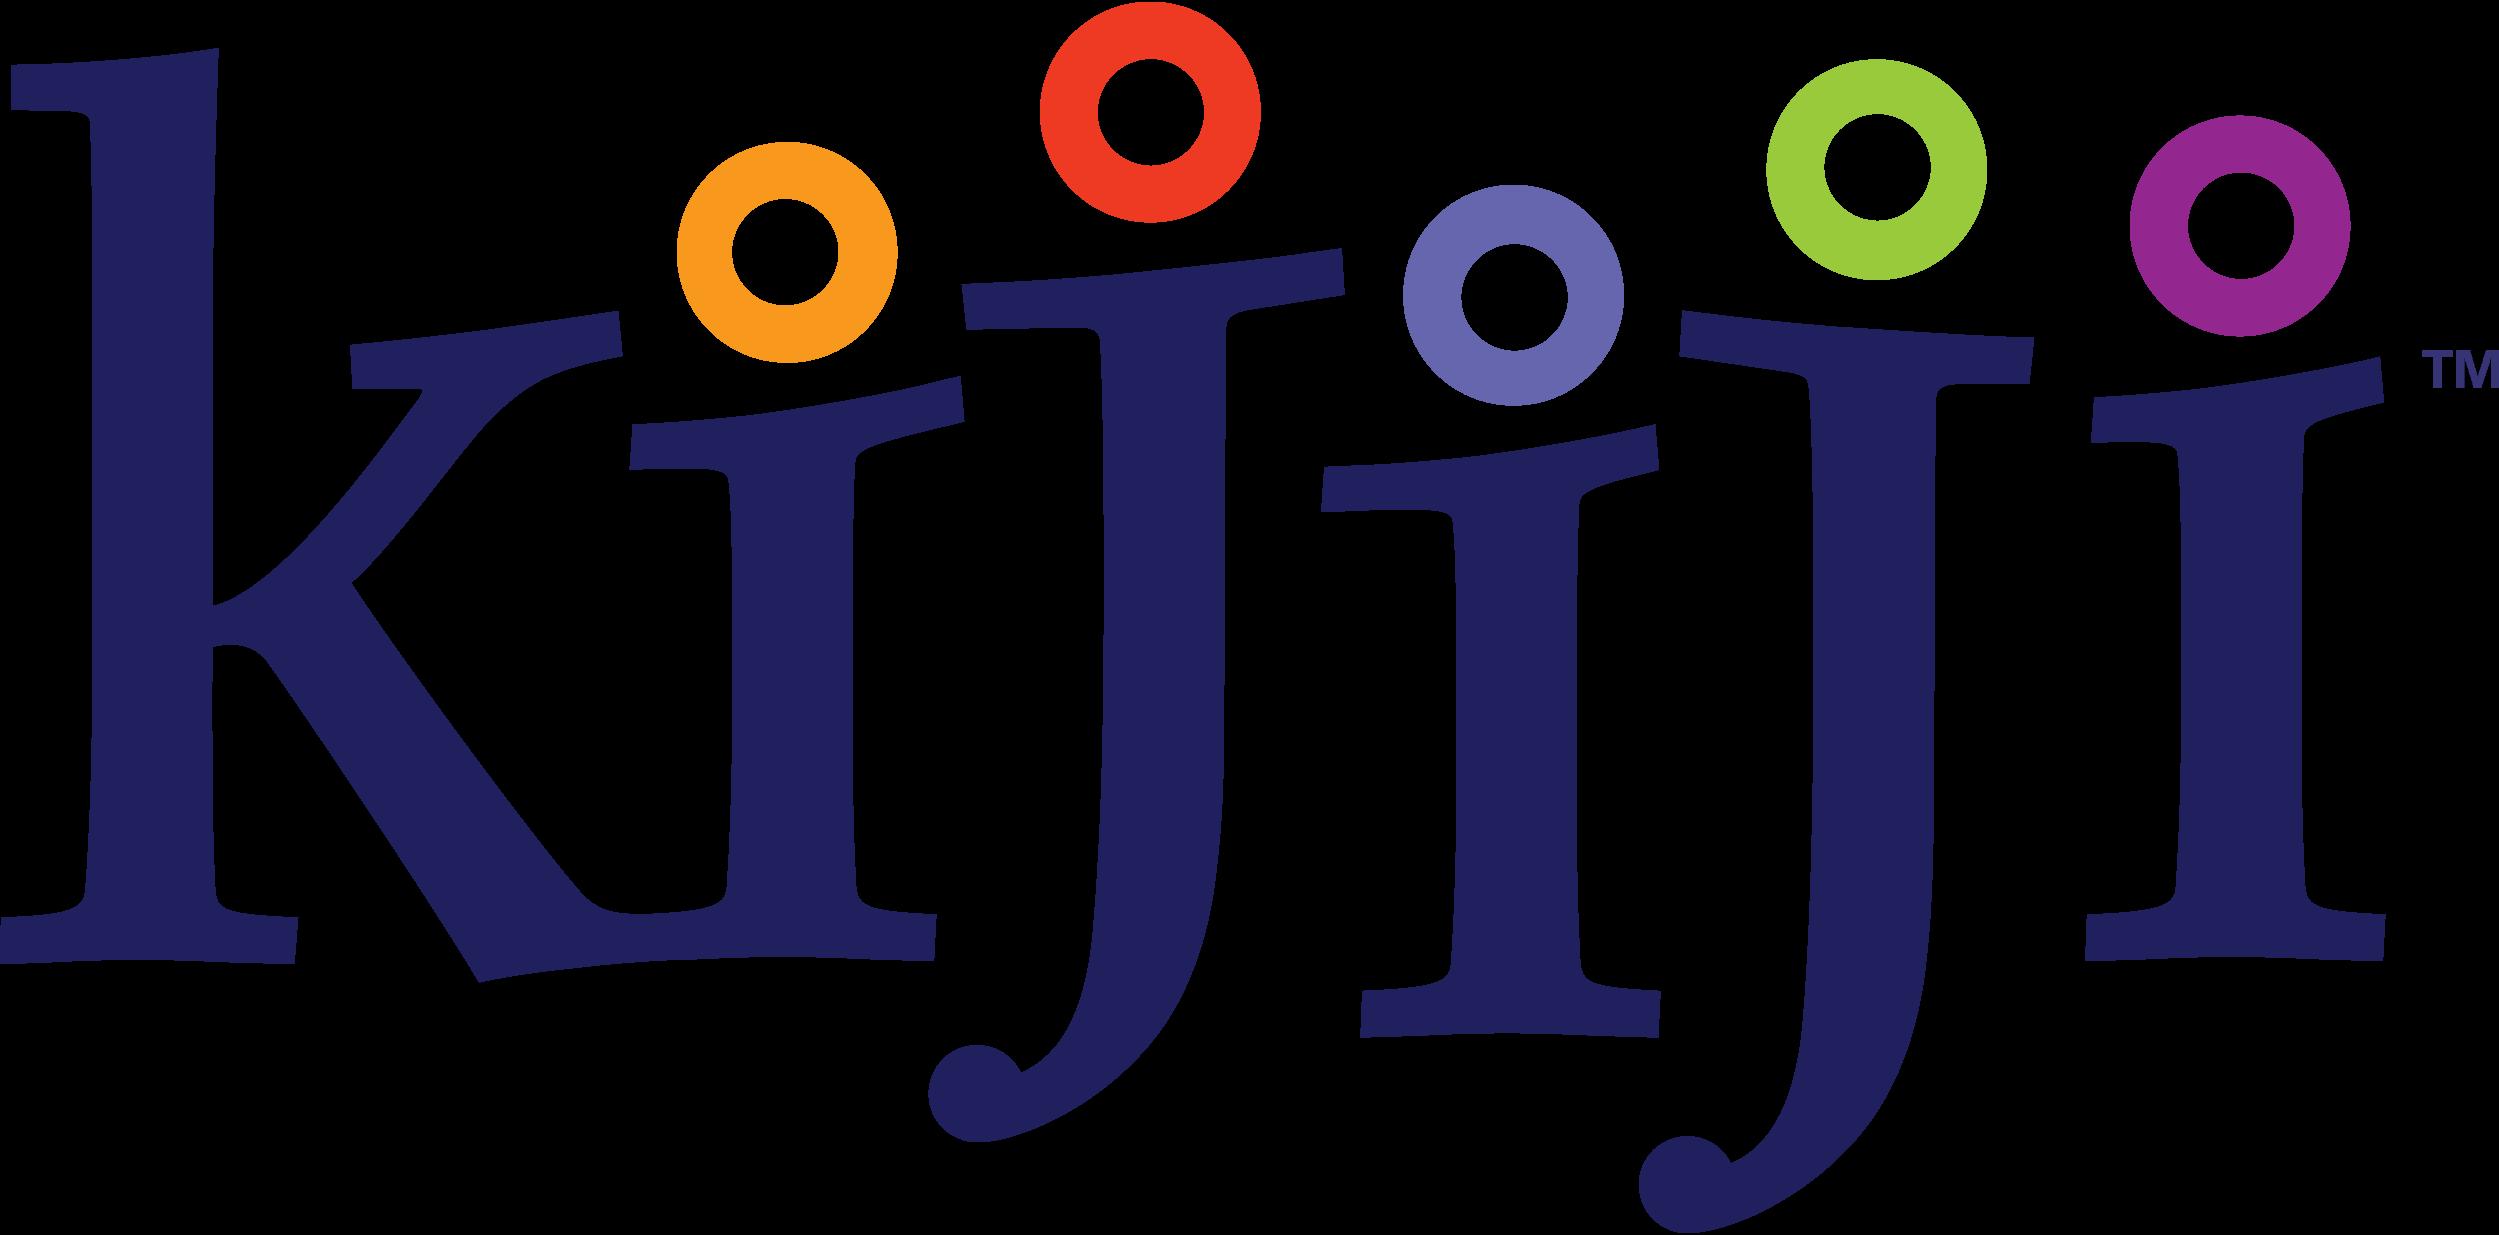 www kijiji de